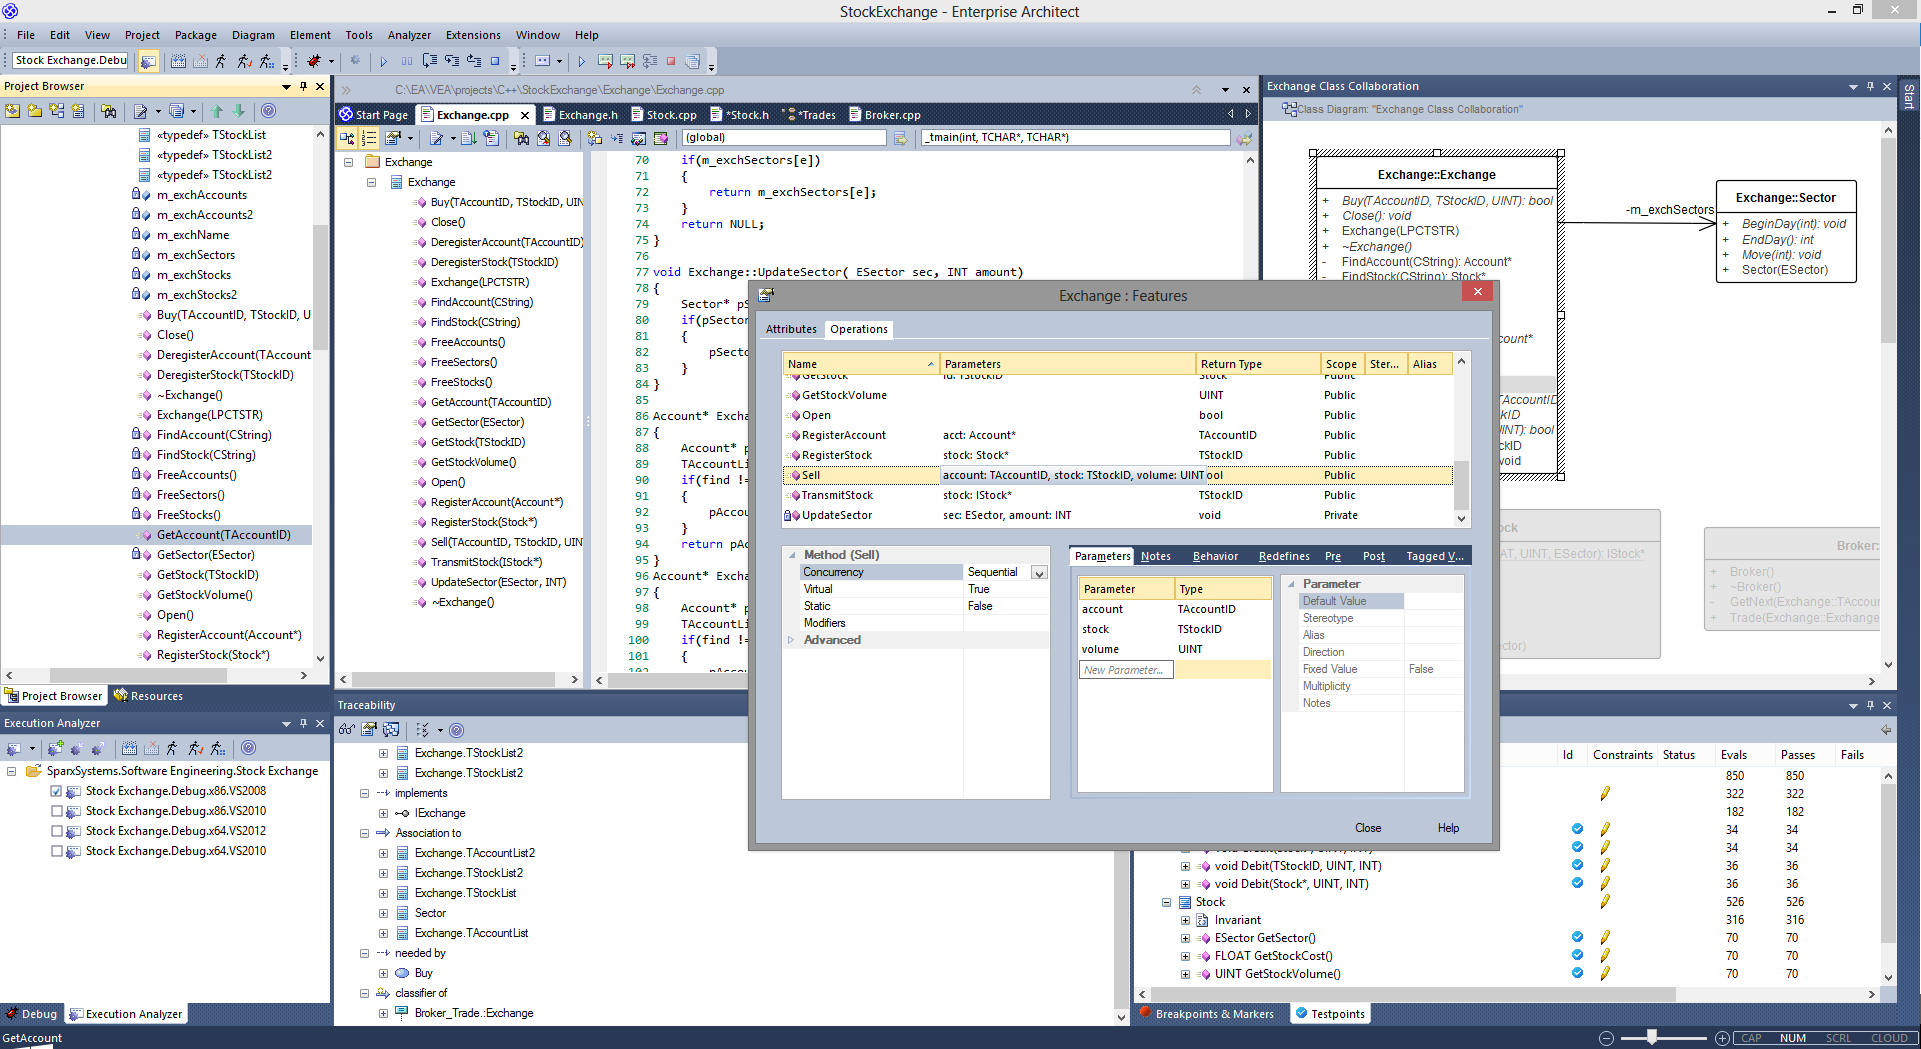 Software engineering enterprise architect user guide for Entreprise architecte download